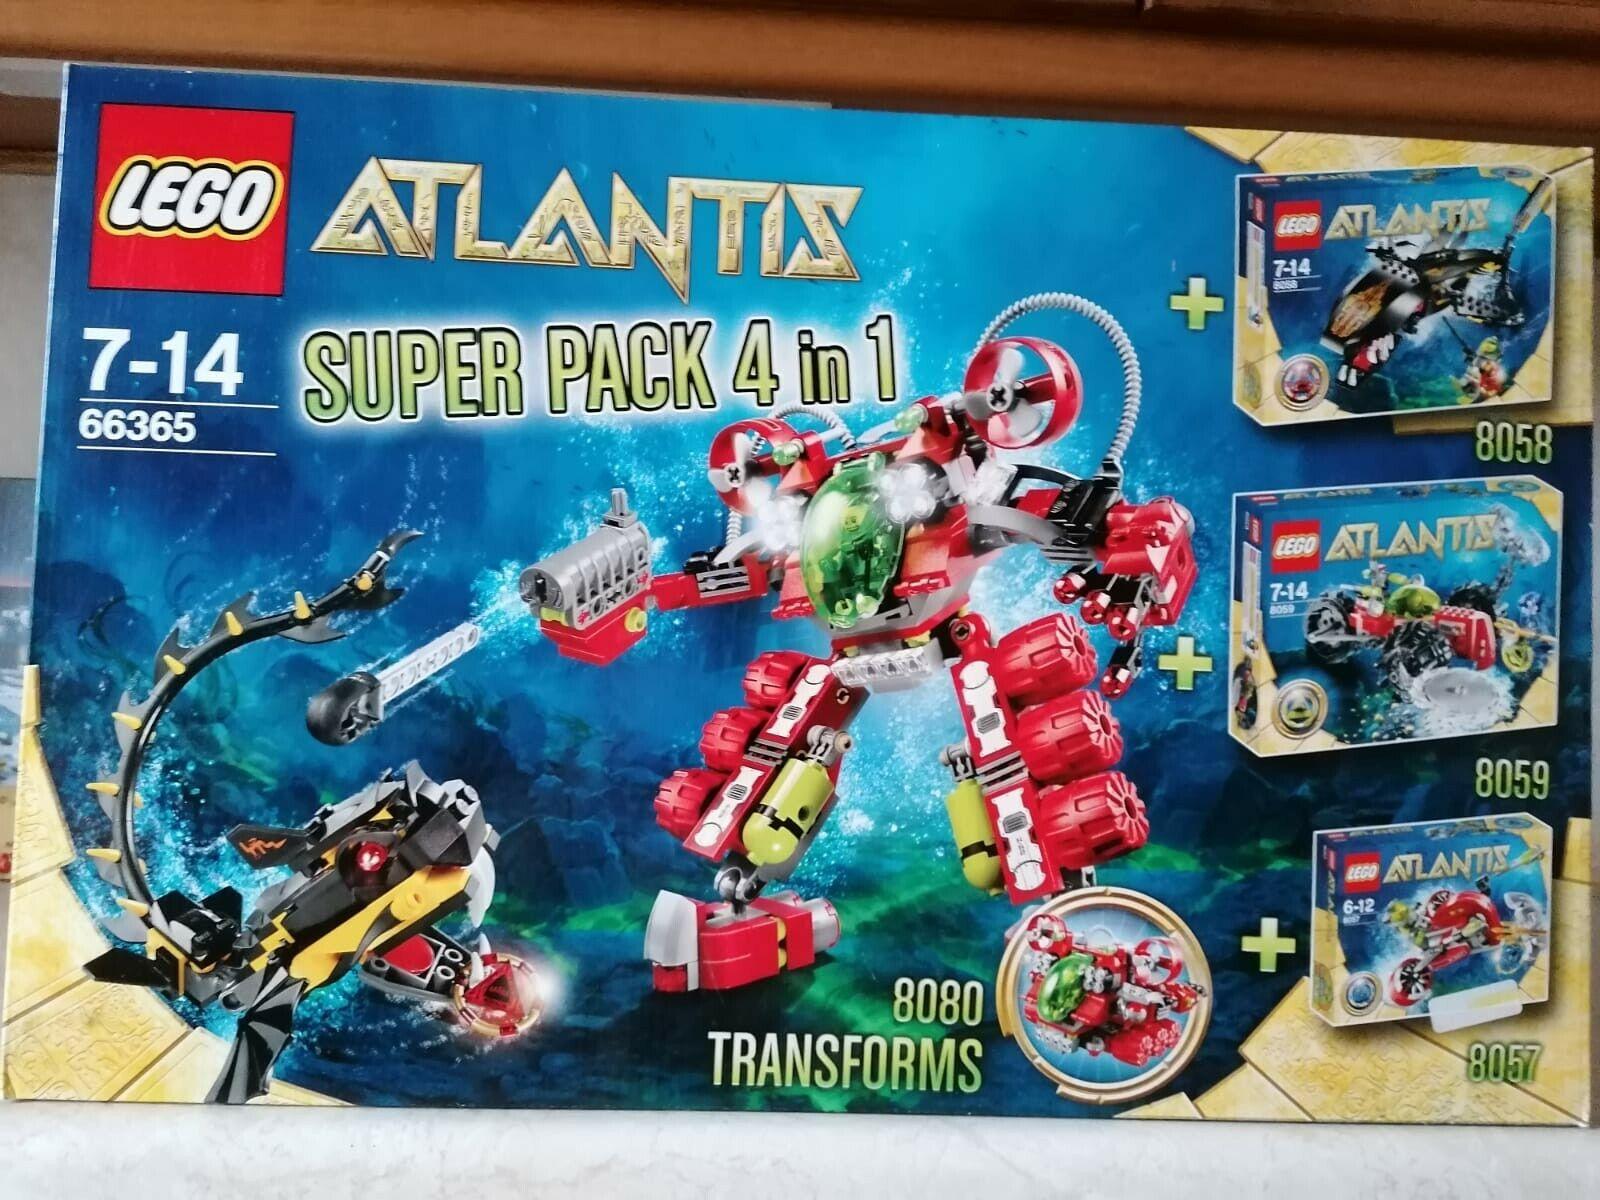 LEGO SET 66365 NEU ATLANTIS SUPER PACK 4 IN 1